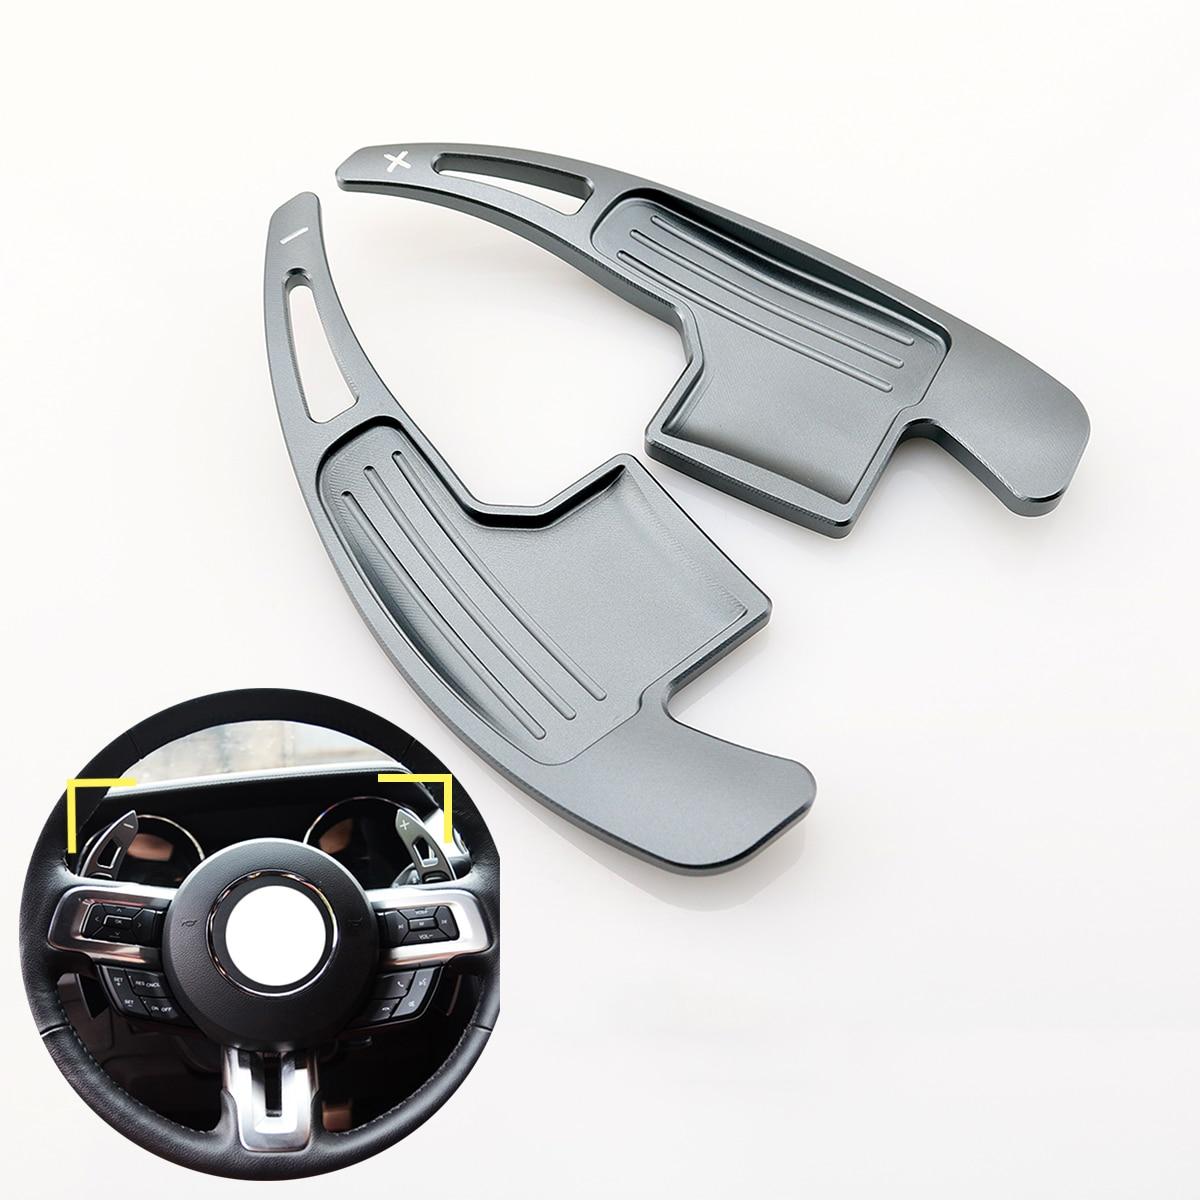 Alliage d'aluminium Décalage Paddle manette de vitesse Extension Volant Sapin Pour Ford Mustang 2015 2016 2017 2018 2019 accessoires-in Volants et Volant Moyeux from Automobiles et Motos on MYMOCCY Store